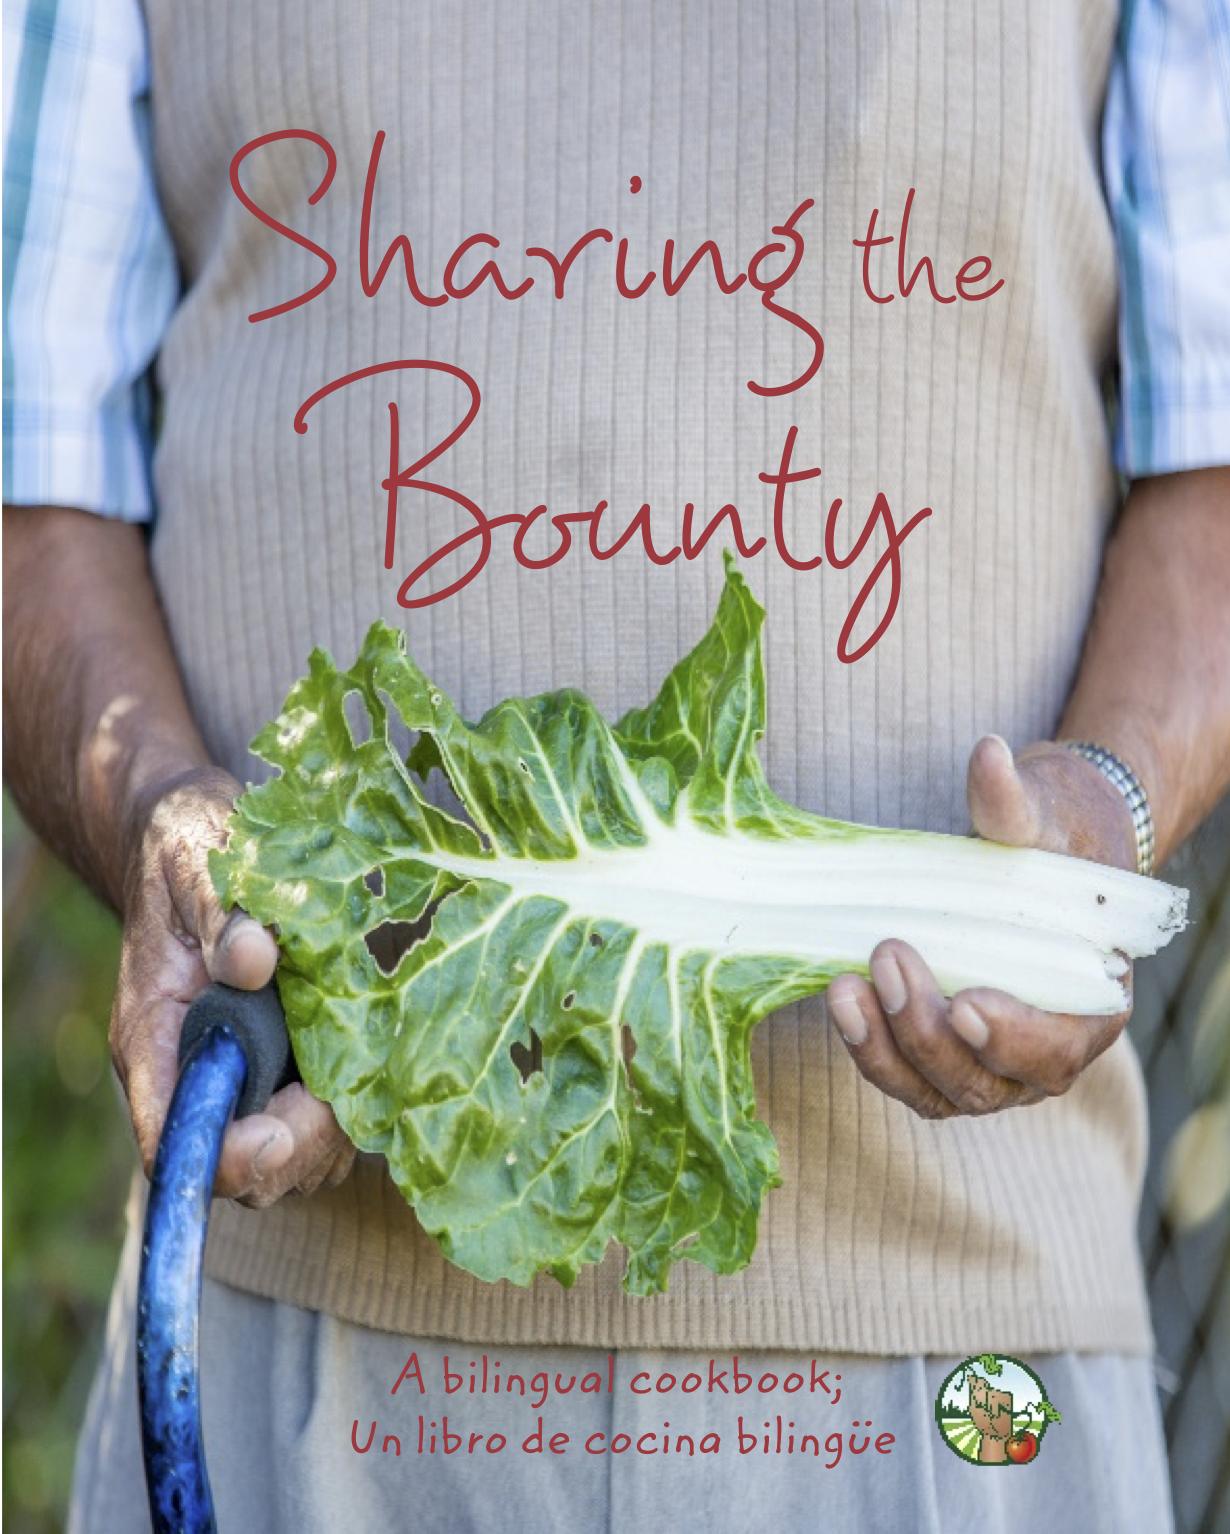 Sharing The Bounty, Bilingual Cookbook